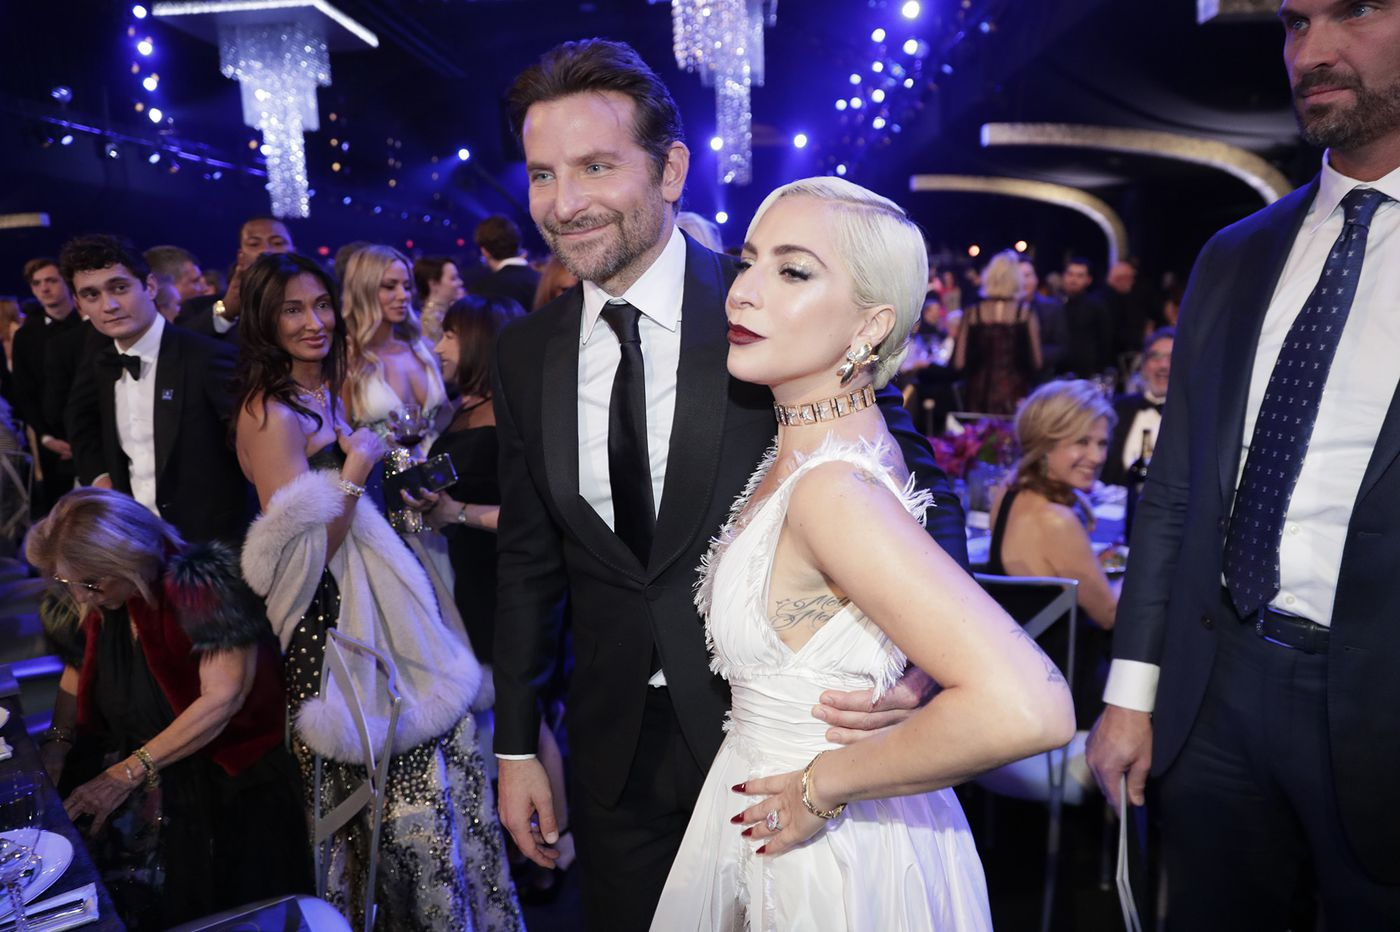 Bradley Cooper tells Oprah he was 'embarrassed' by Oscars snub